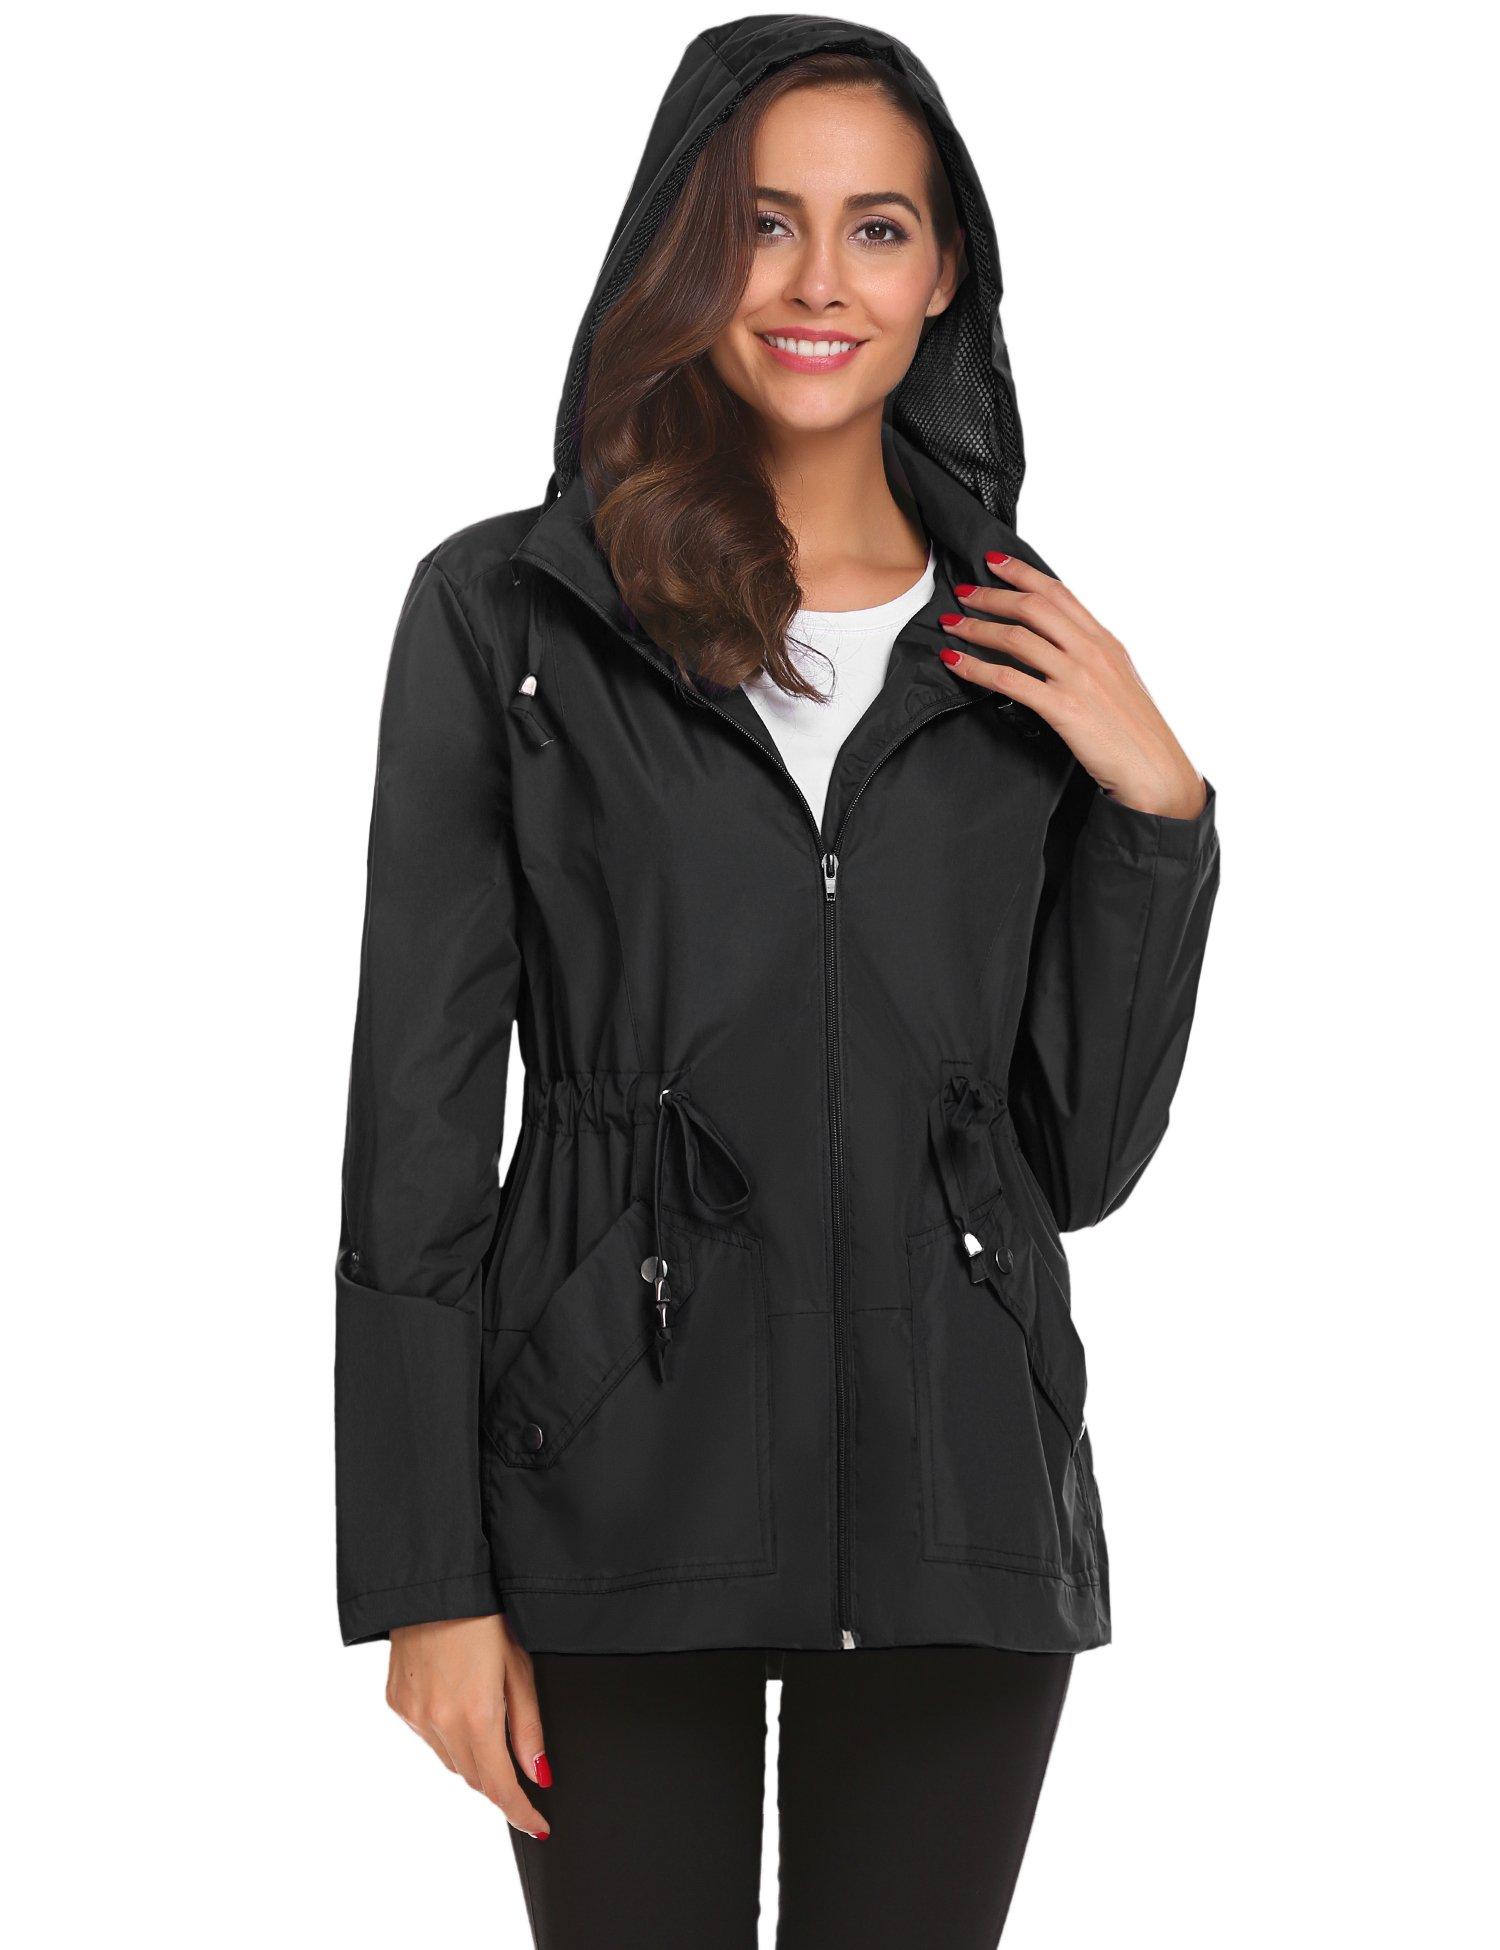 Romanstii Outdoor Jacket Women,Waterproof Raincoat with Hood Active for Camping Hiking 2X by Romanstii (Image #4)